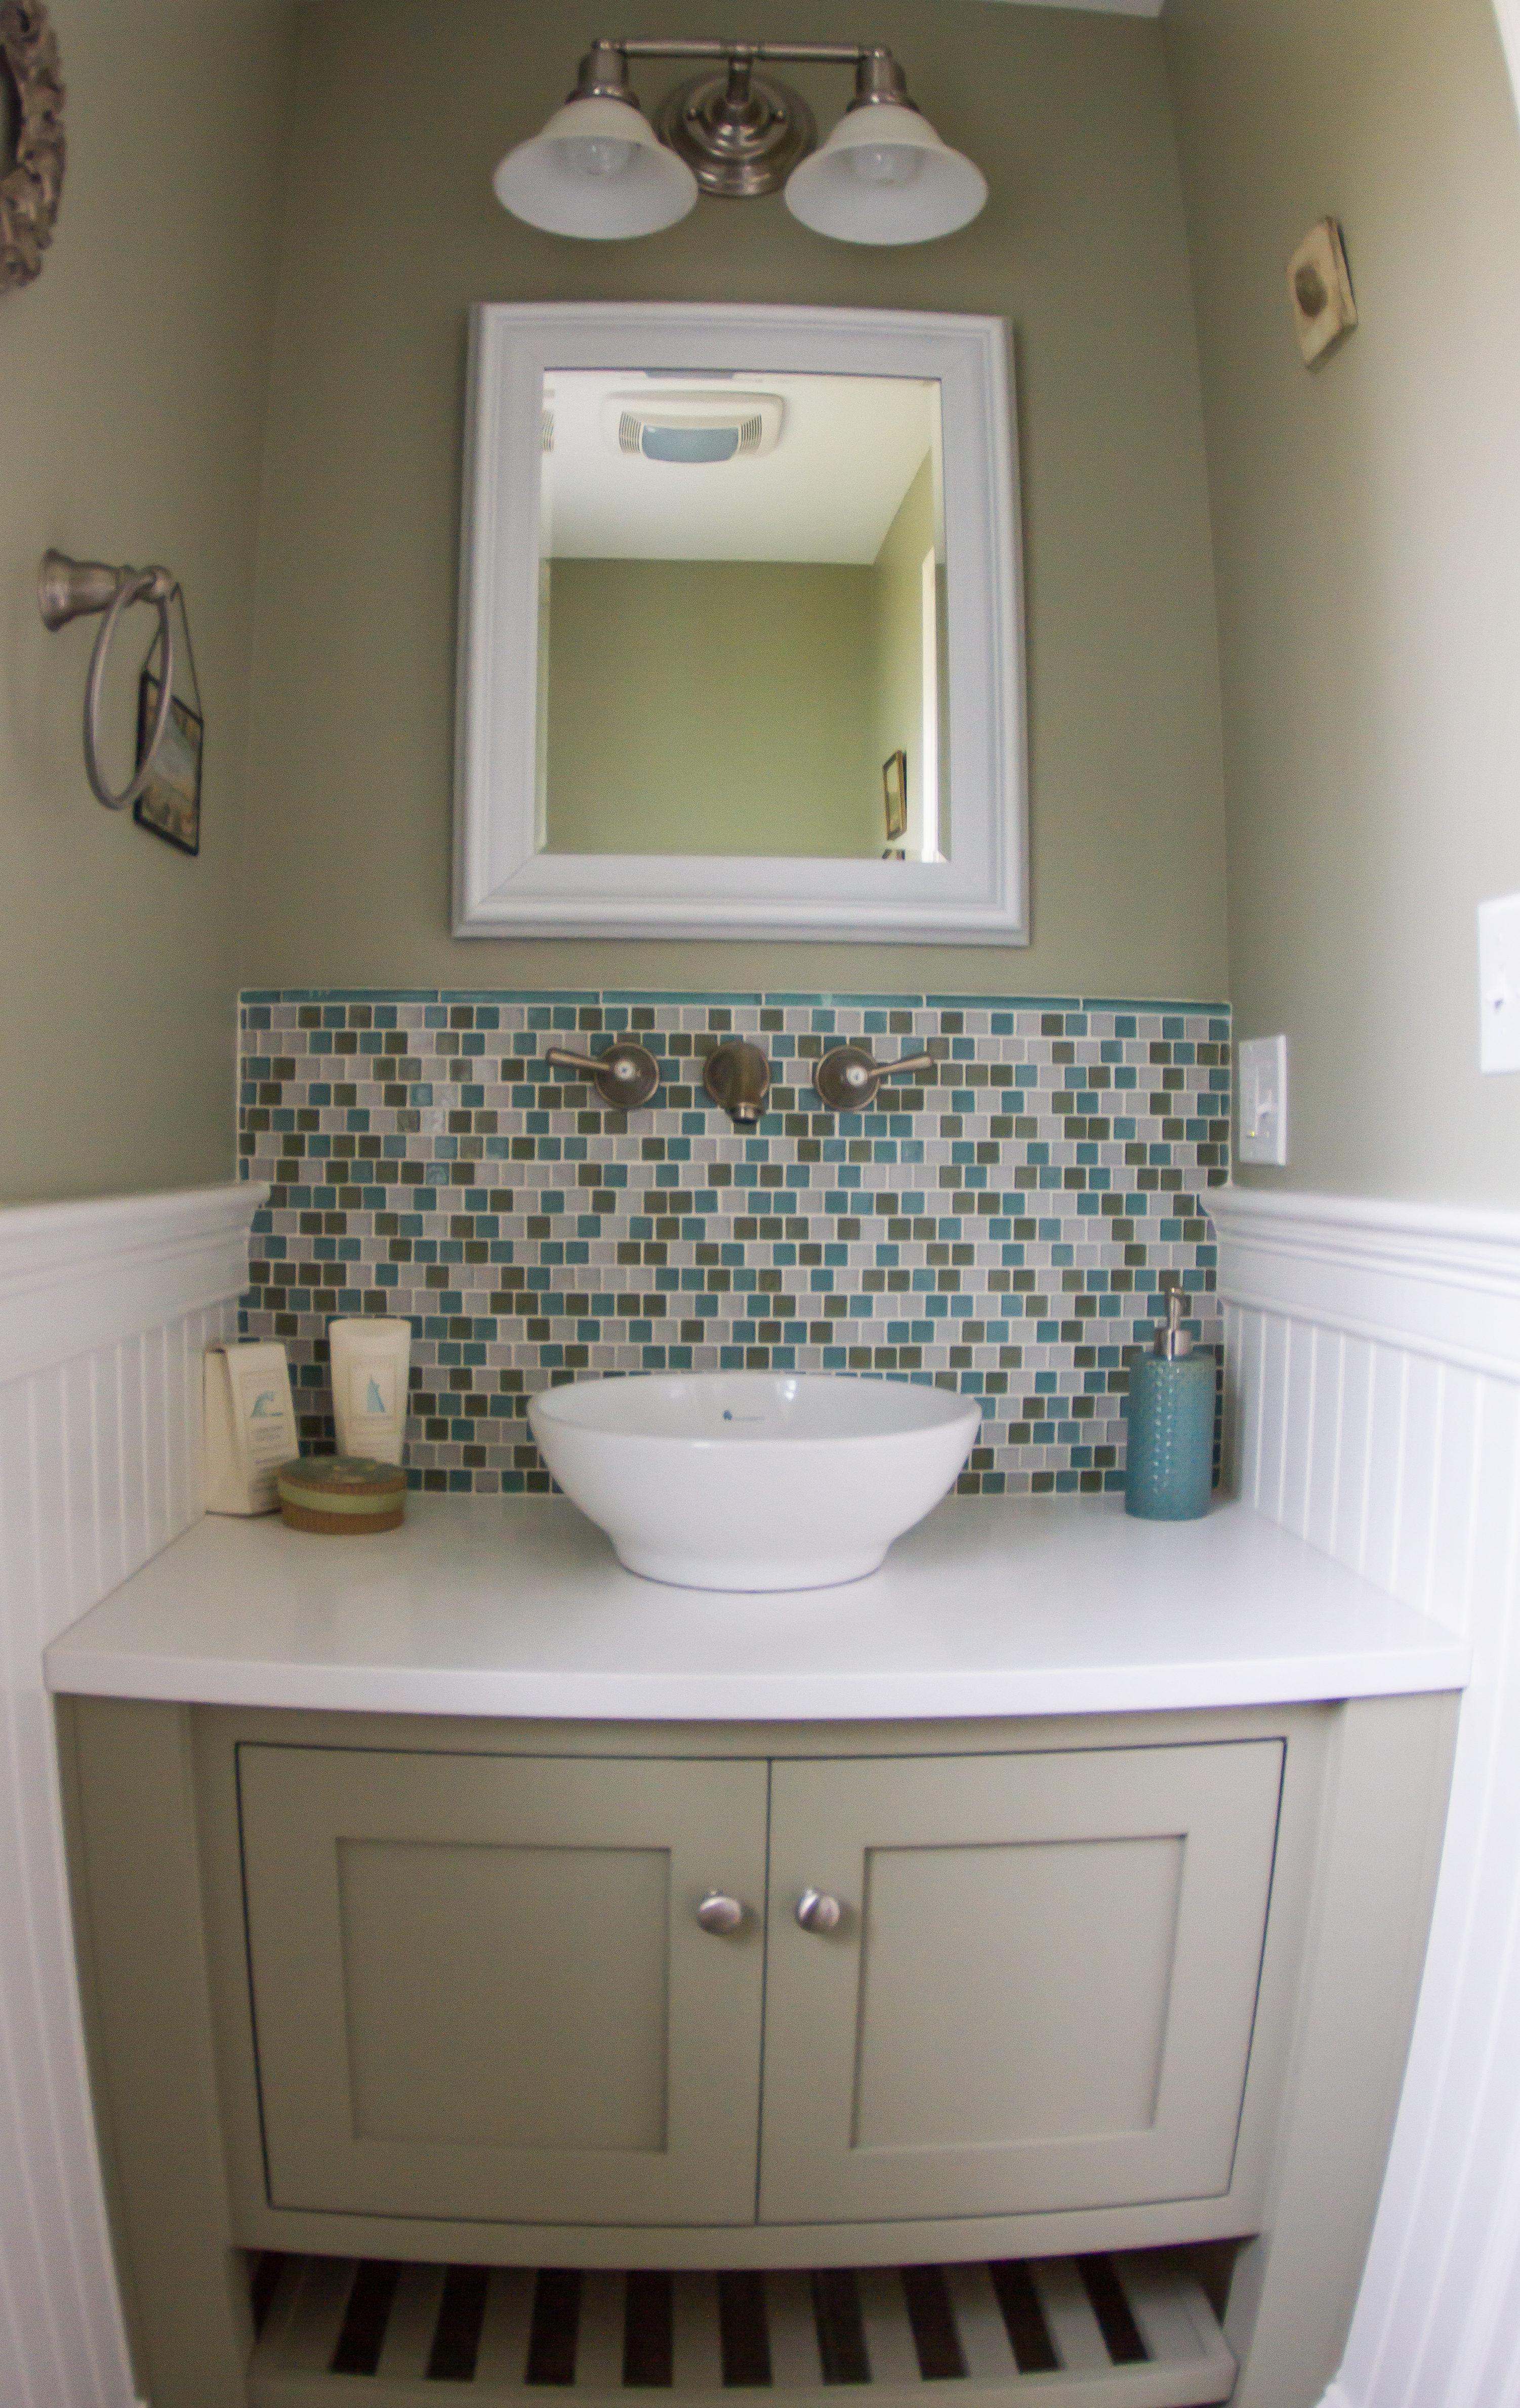 Bathroom Design And Renovations. Kennebunk Kitchens And Baths Drakes Island Renovation Bath Design Renovation